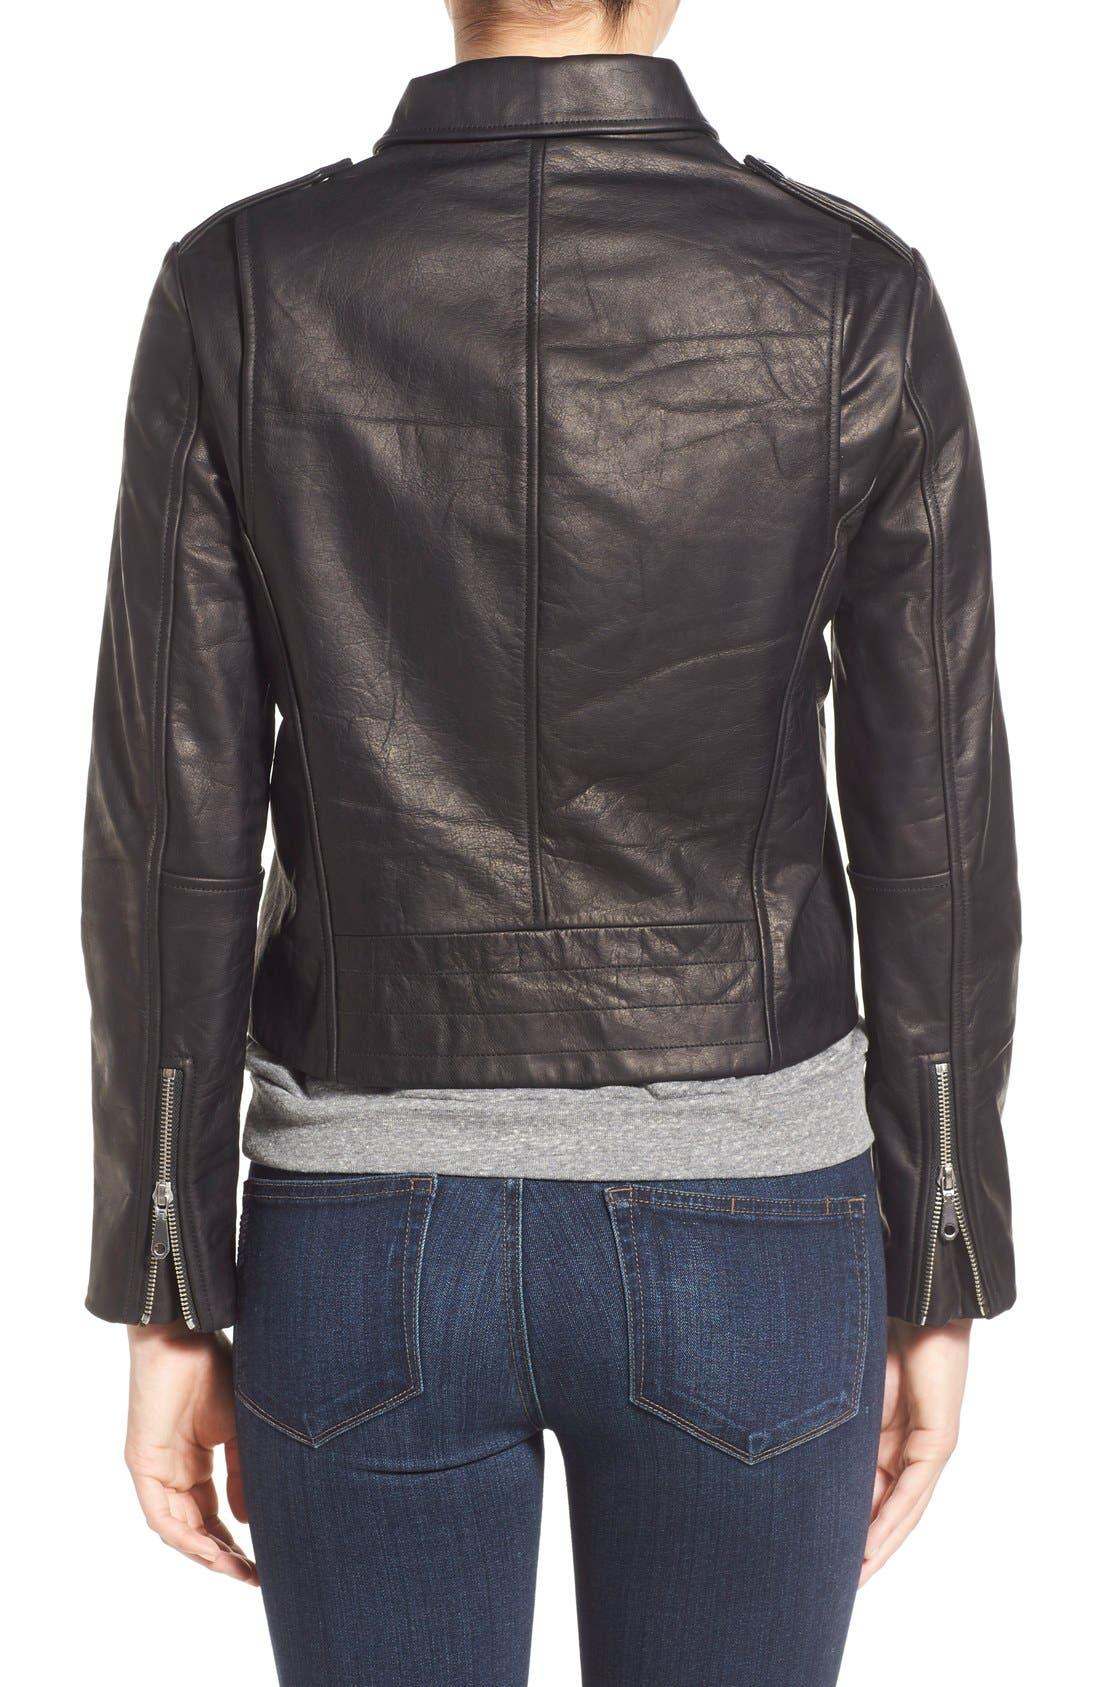 REBECCA MINKOFF, 'Nana' Leather Moto Jacket, Alternate thumbnail 2, color, 001